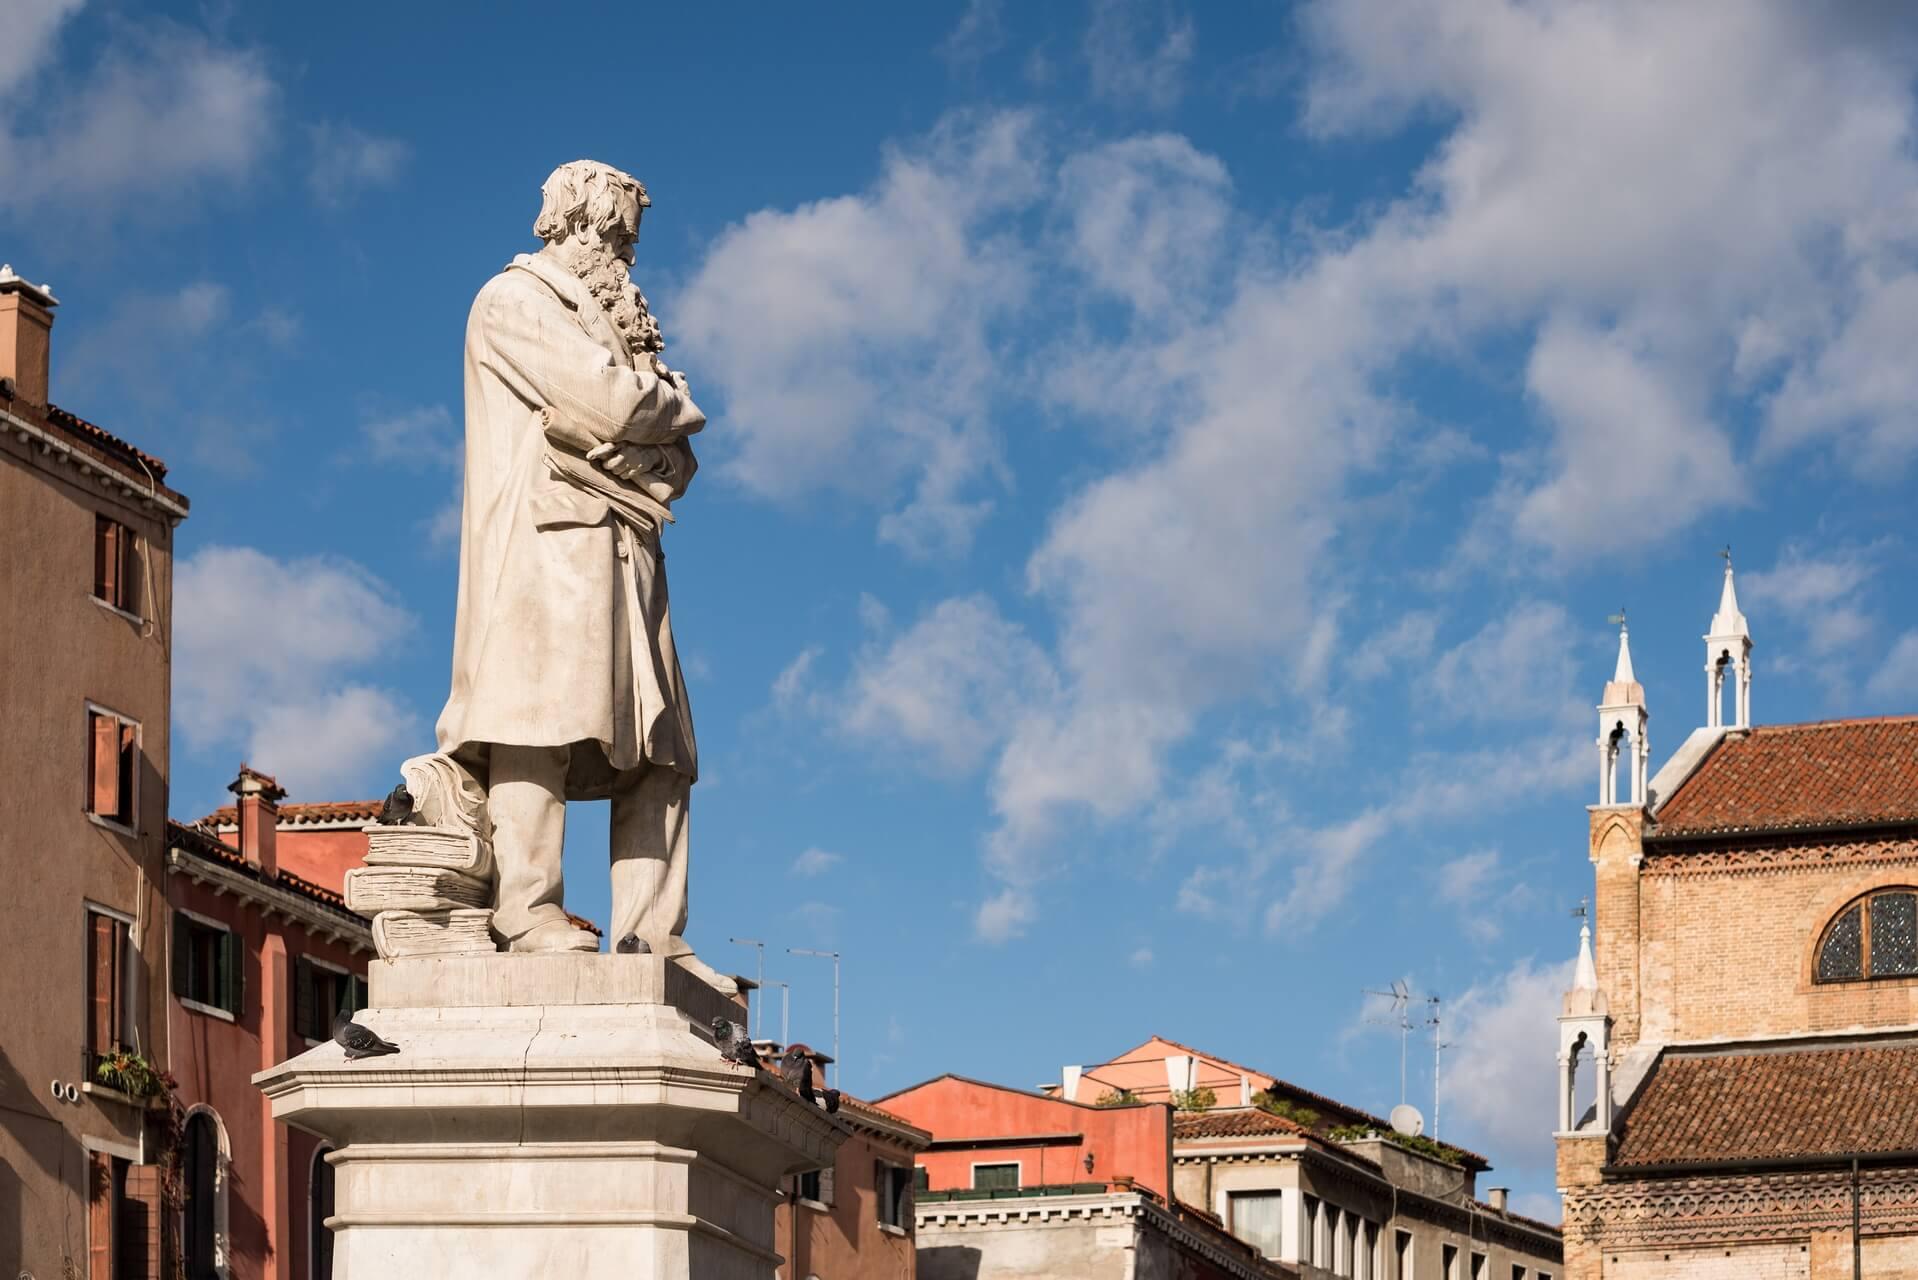 Italien: Venedig Italiy: Venice, Fotograf: Steffen Lohse